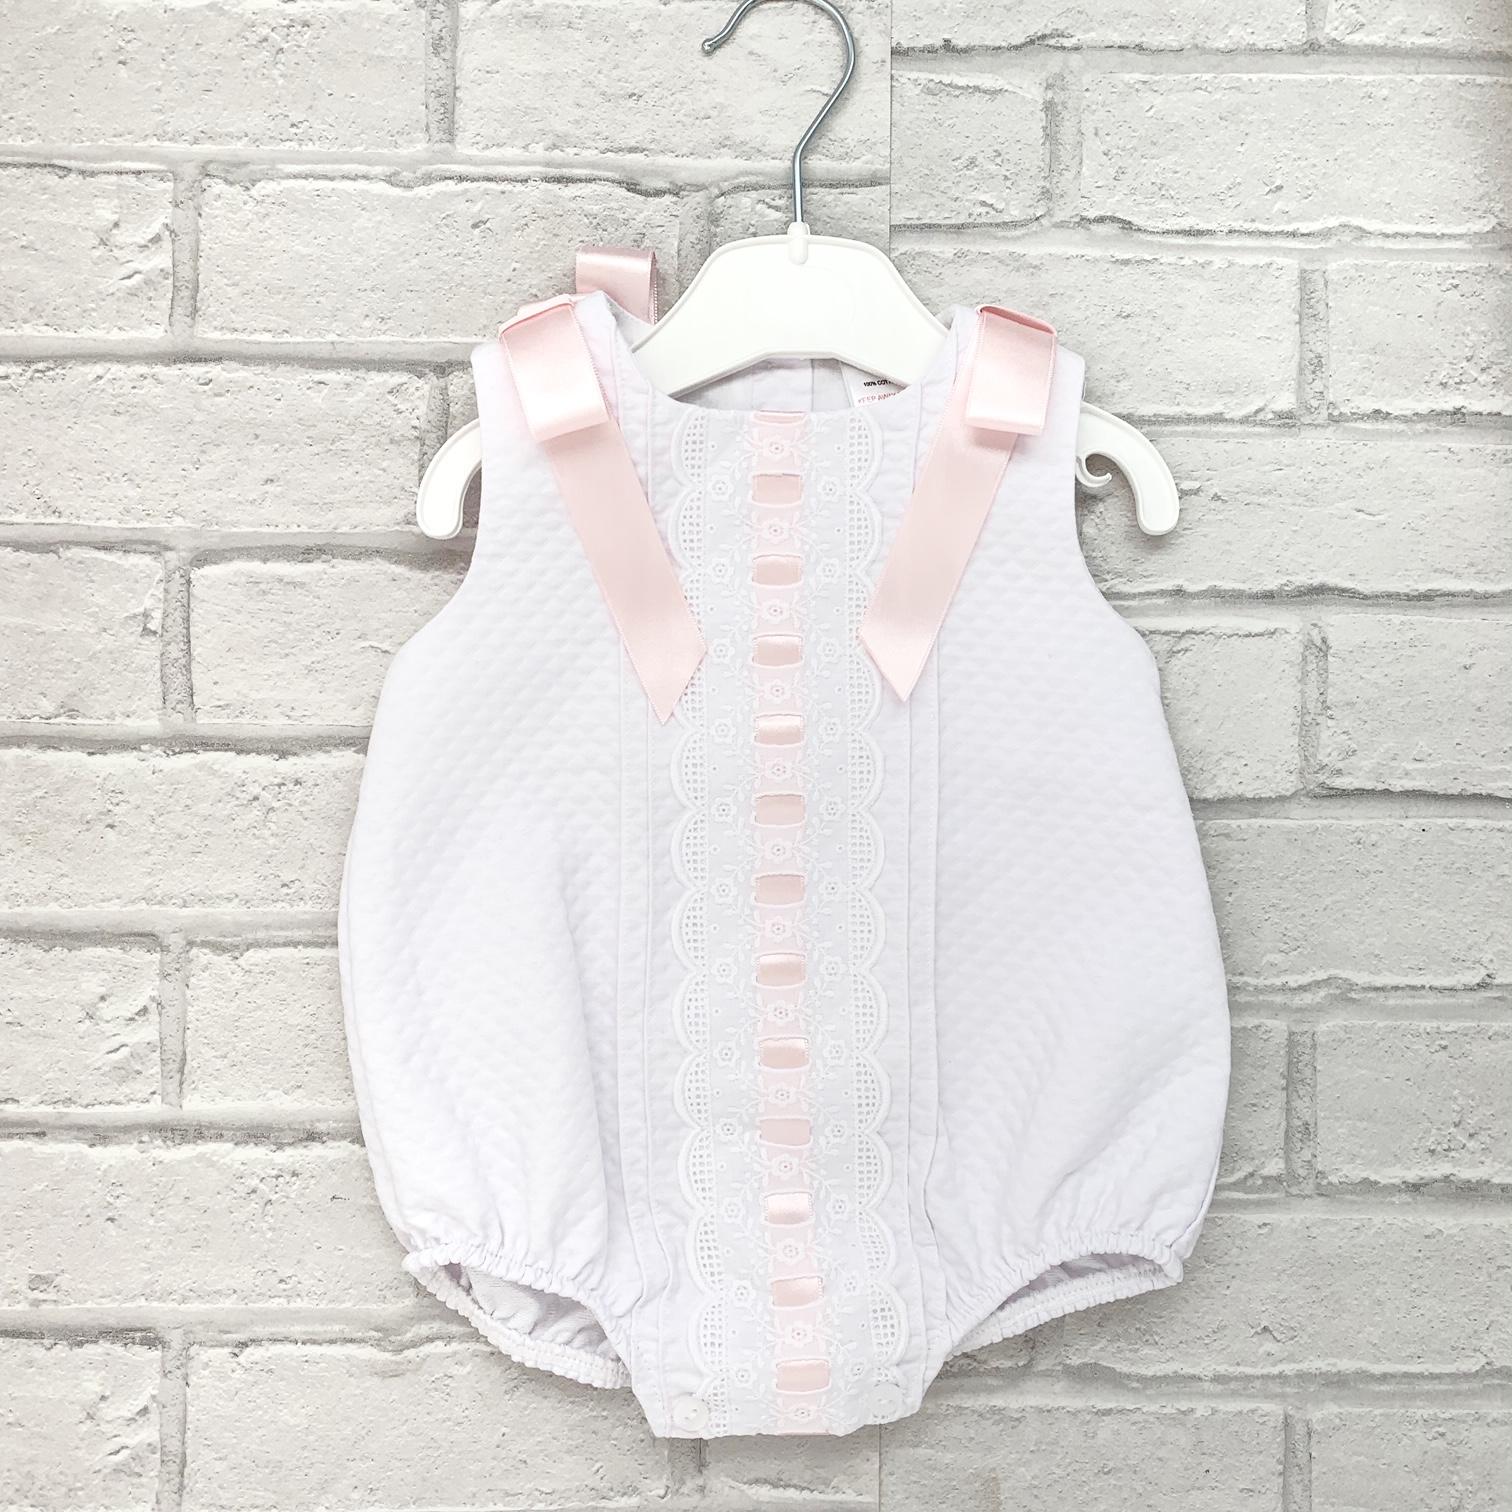 Baby Girls White Romper Suit